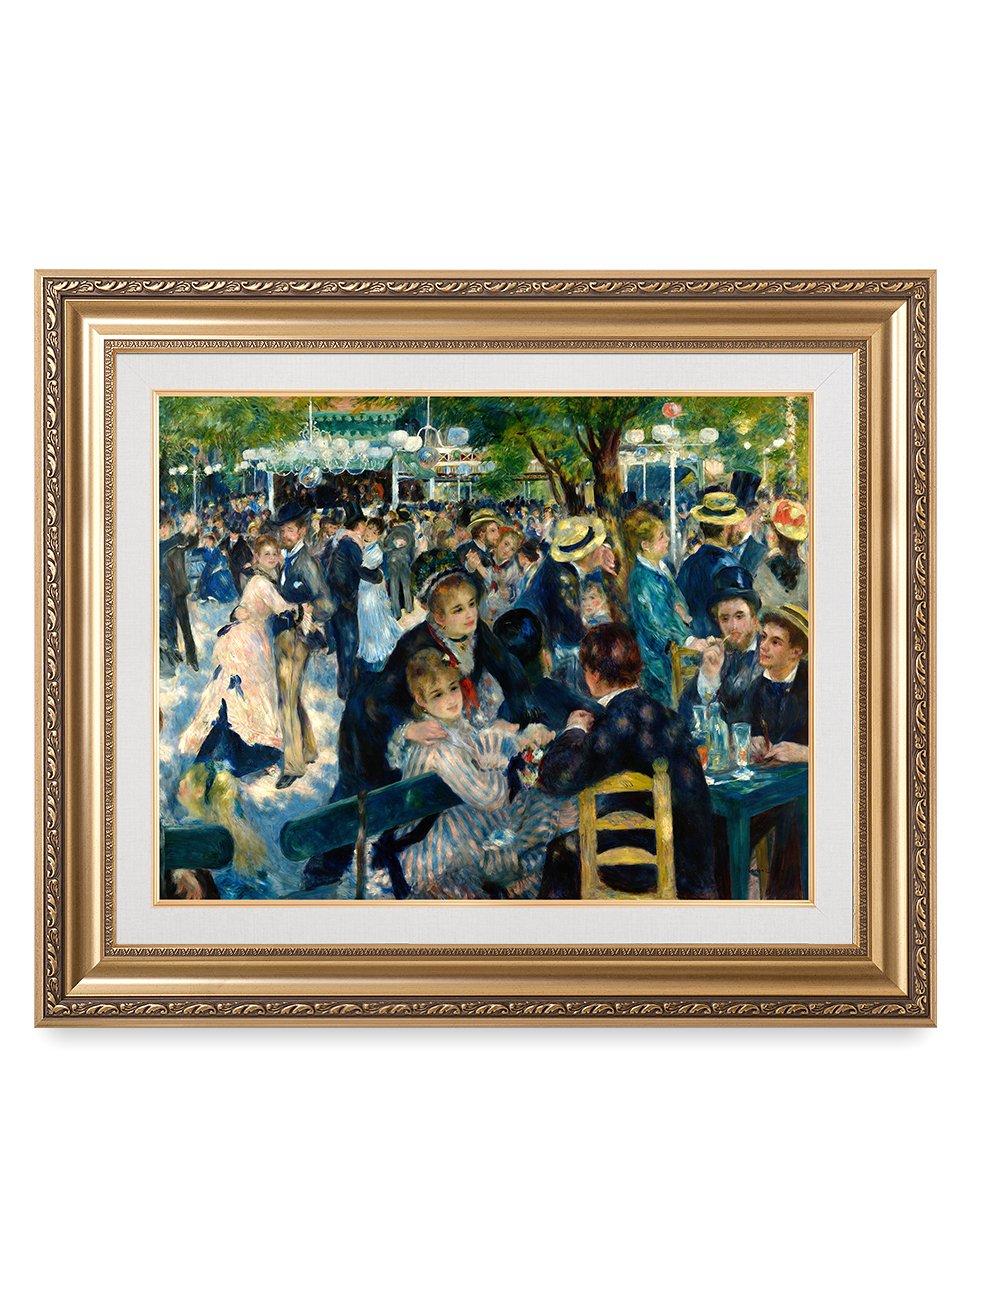 DecorArts - Bal du moulin de la Galette, Pierre-Auguste Renoir Classic Art. Giclee Prints Framed Art for Wall Decor. Framed size: 36x30'' by DECORARTS